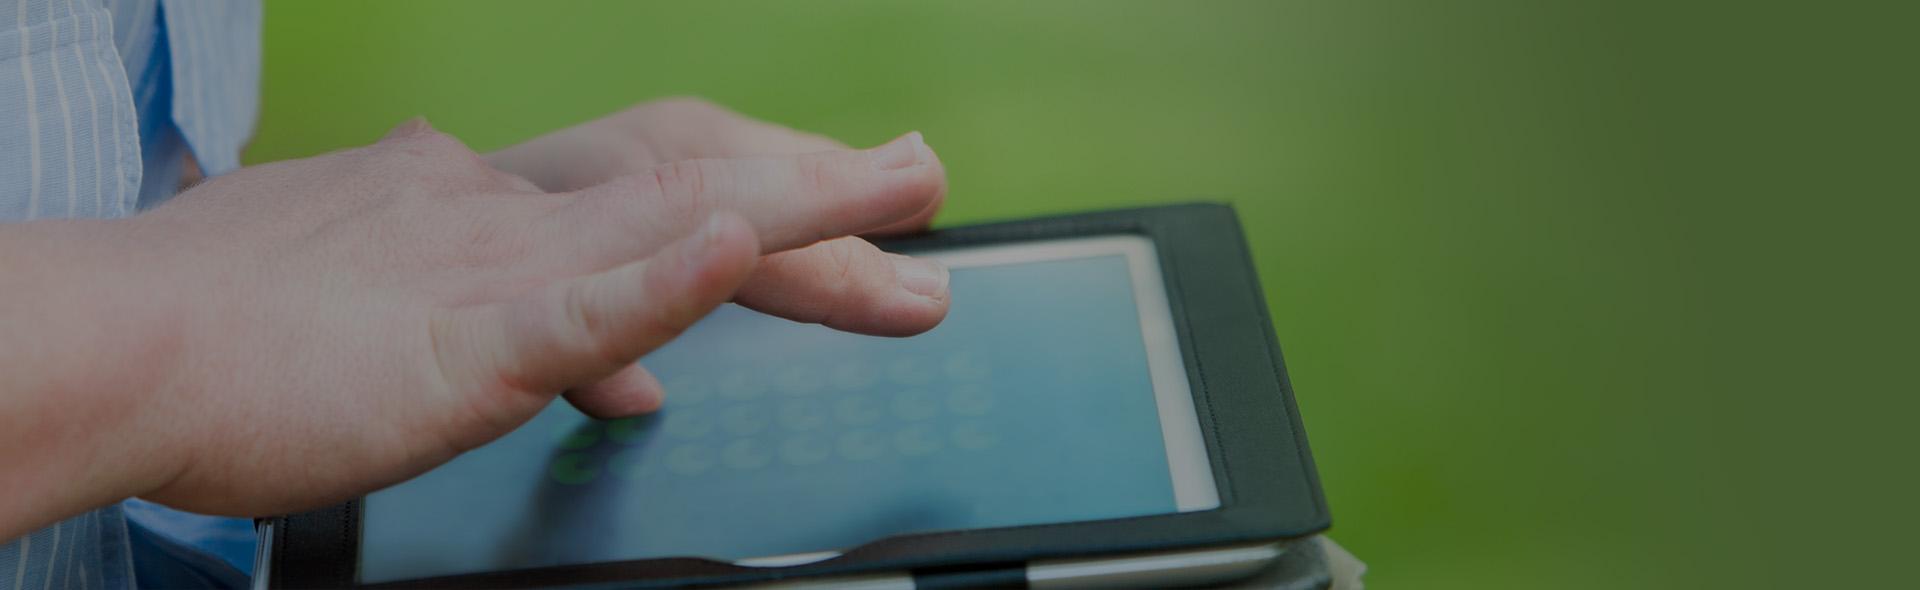 digitamine-application-patient-reeducation